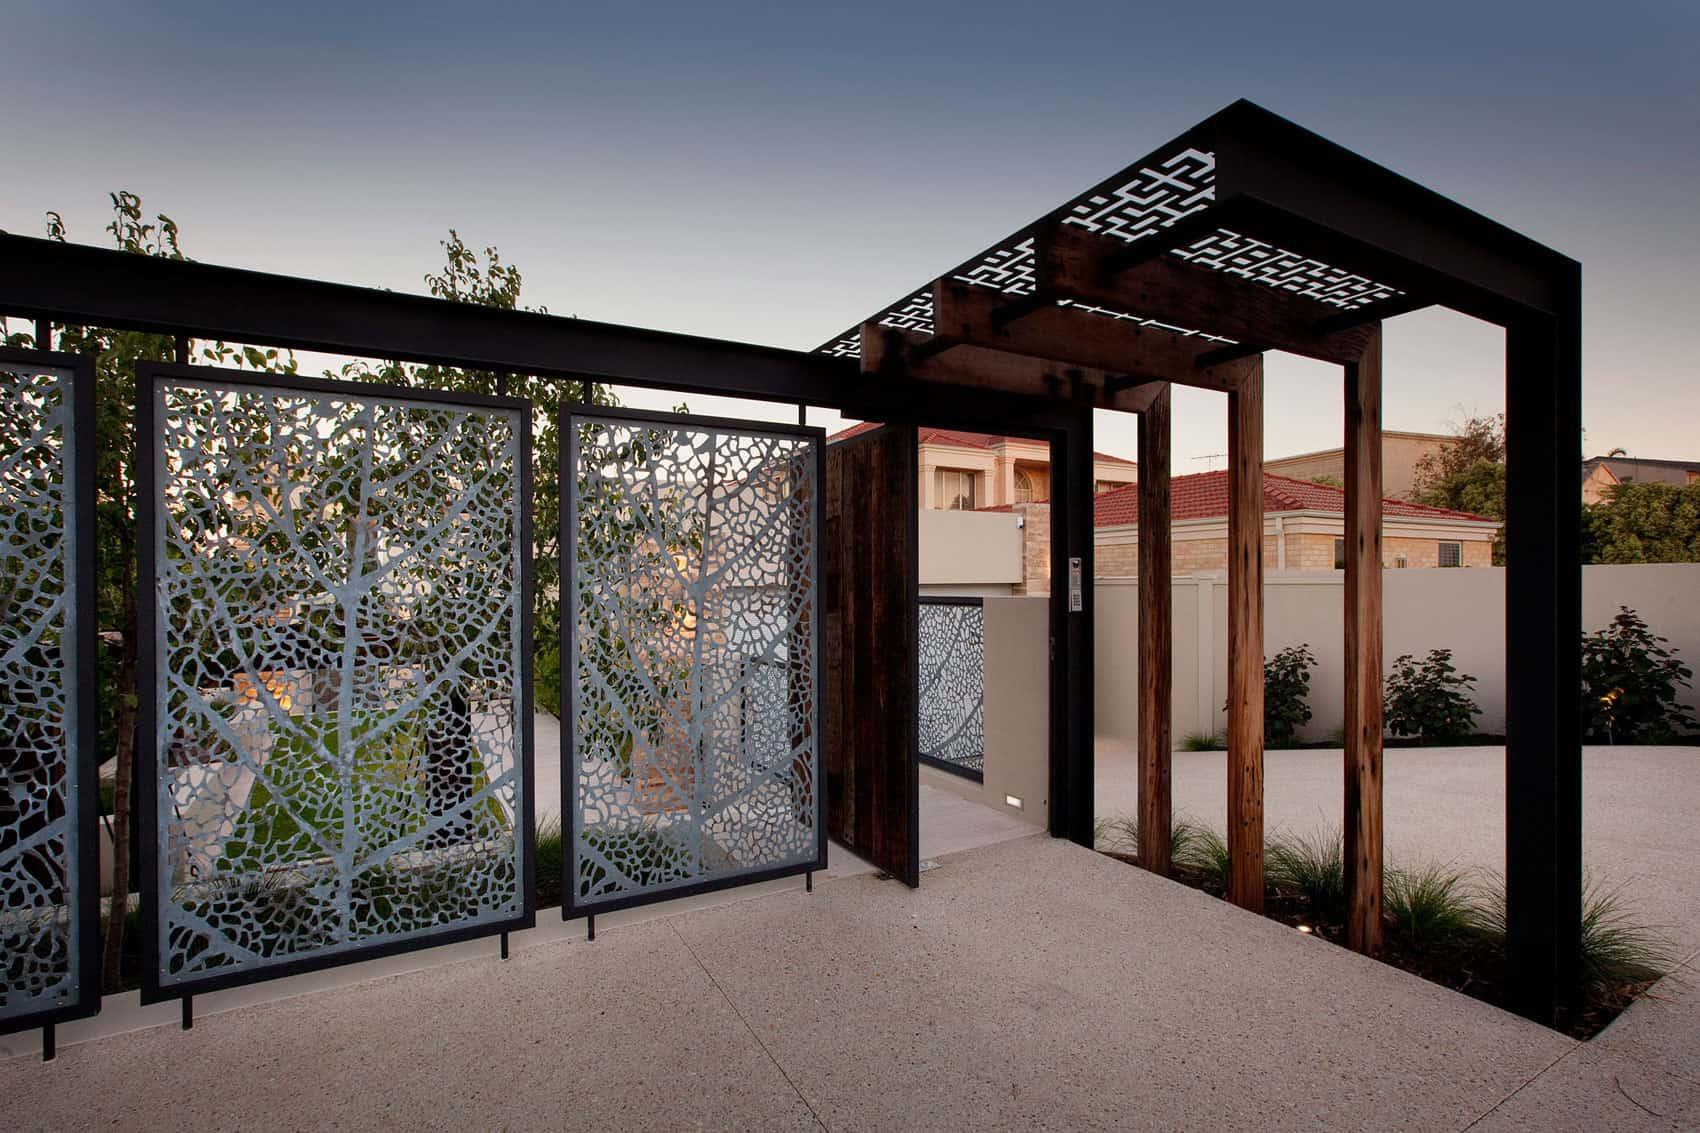 Bicton by Ritz Exterior Design (2)